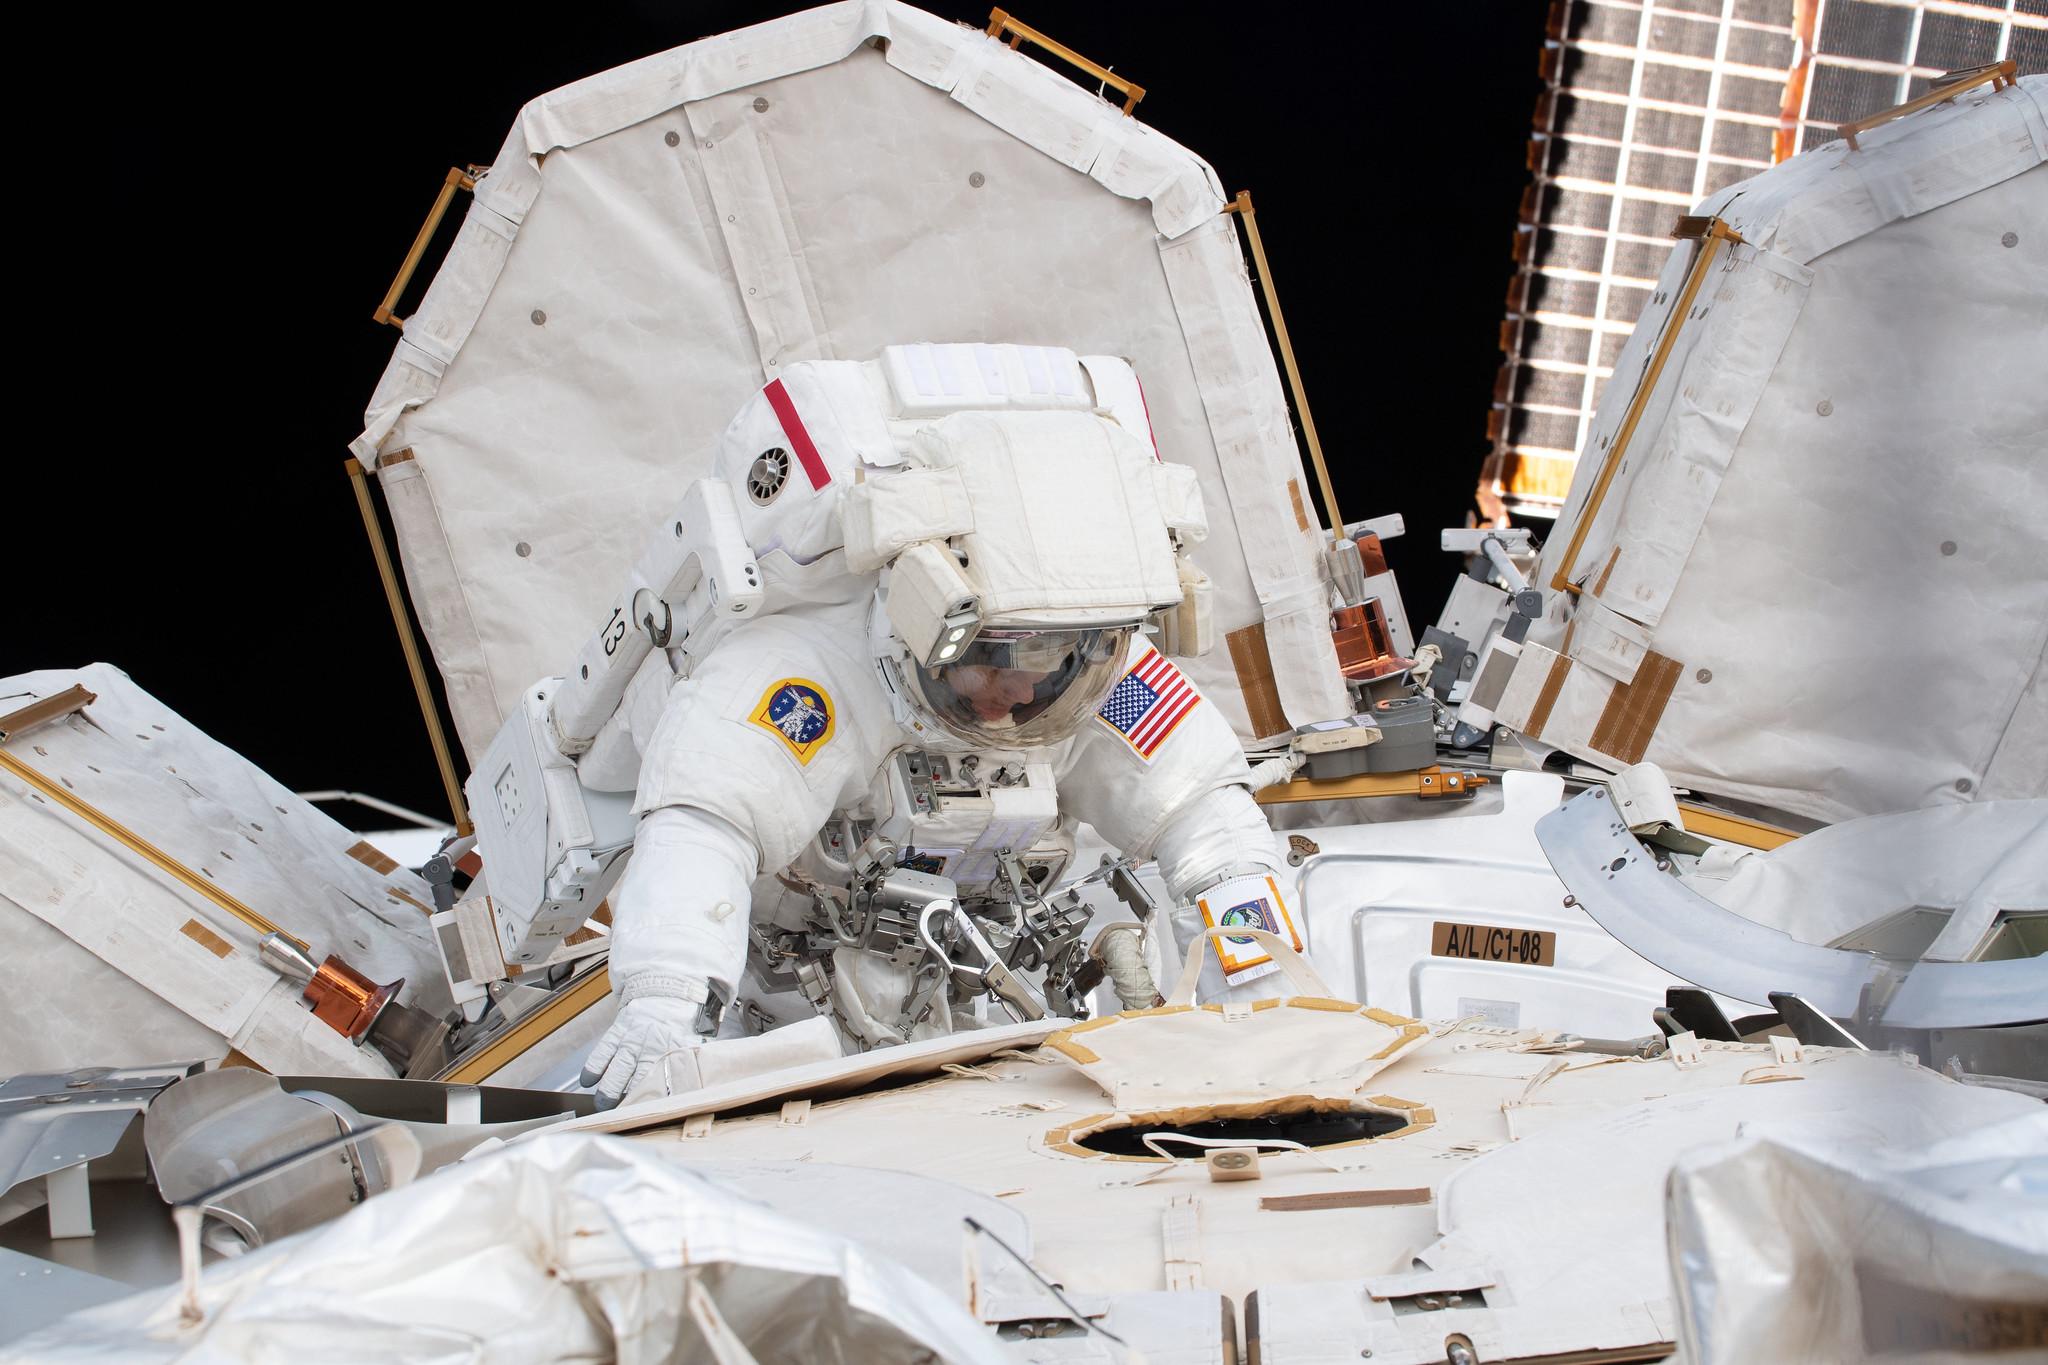 NASA astronaut Anne McClain as seen during her first spacewalk on March 22, 2019. Credit: NASA